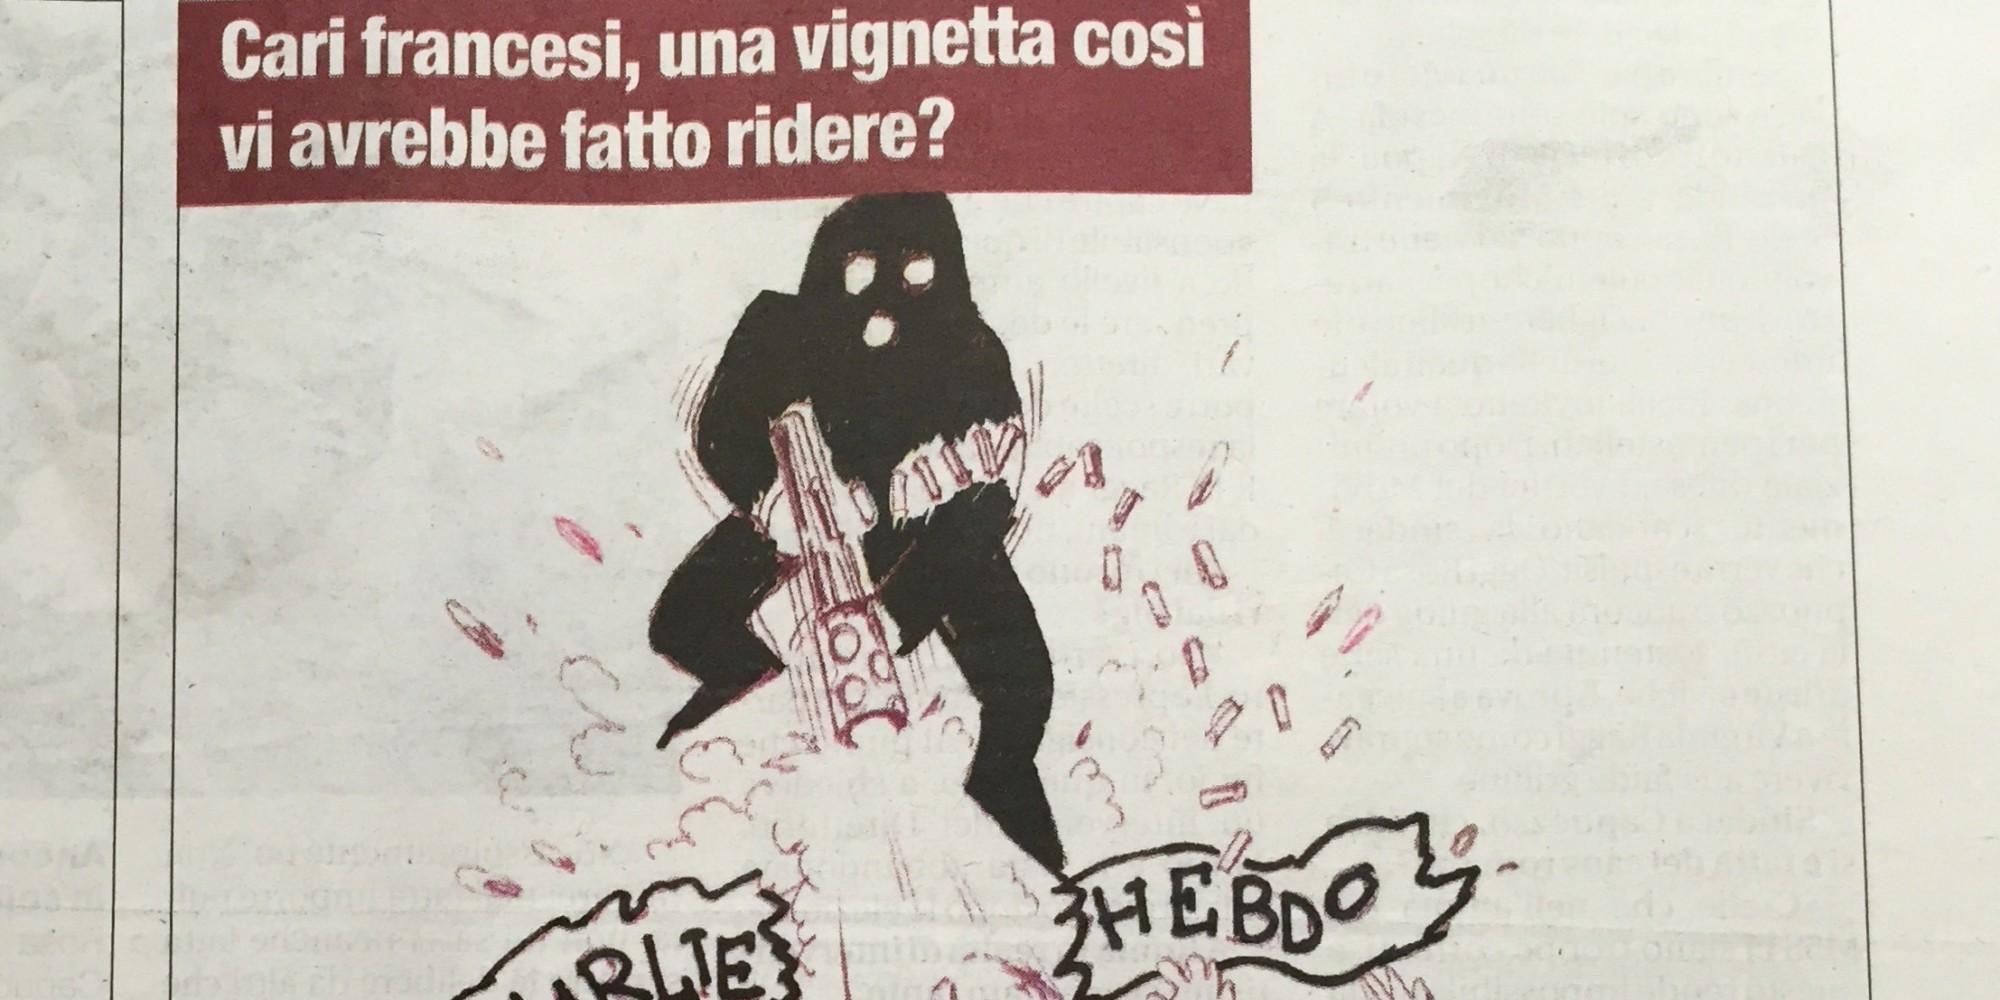 charlie hebdo risposta vignettisti italiani